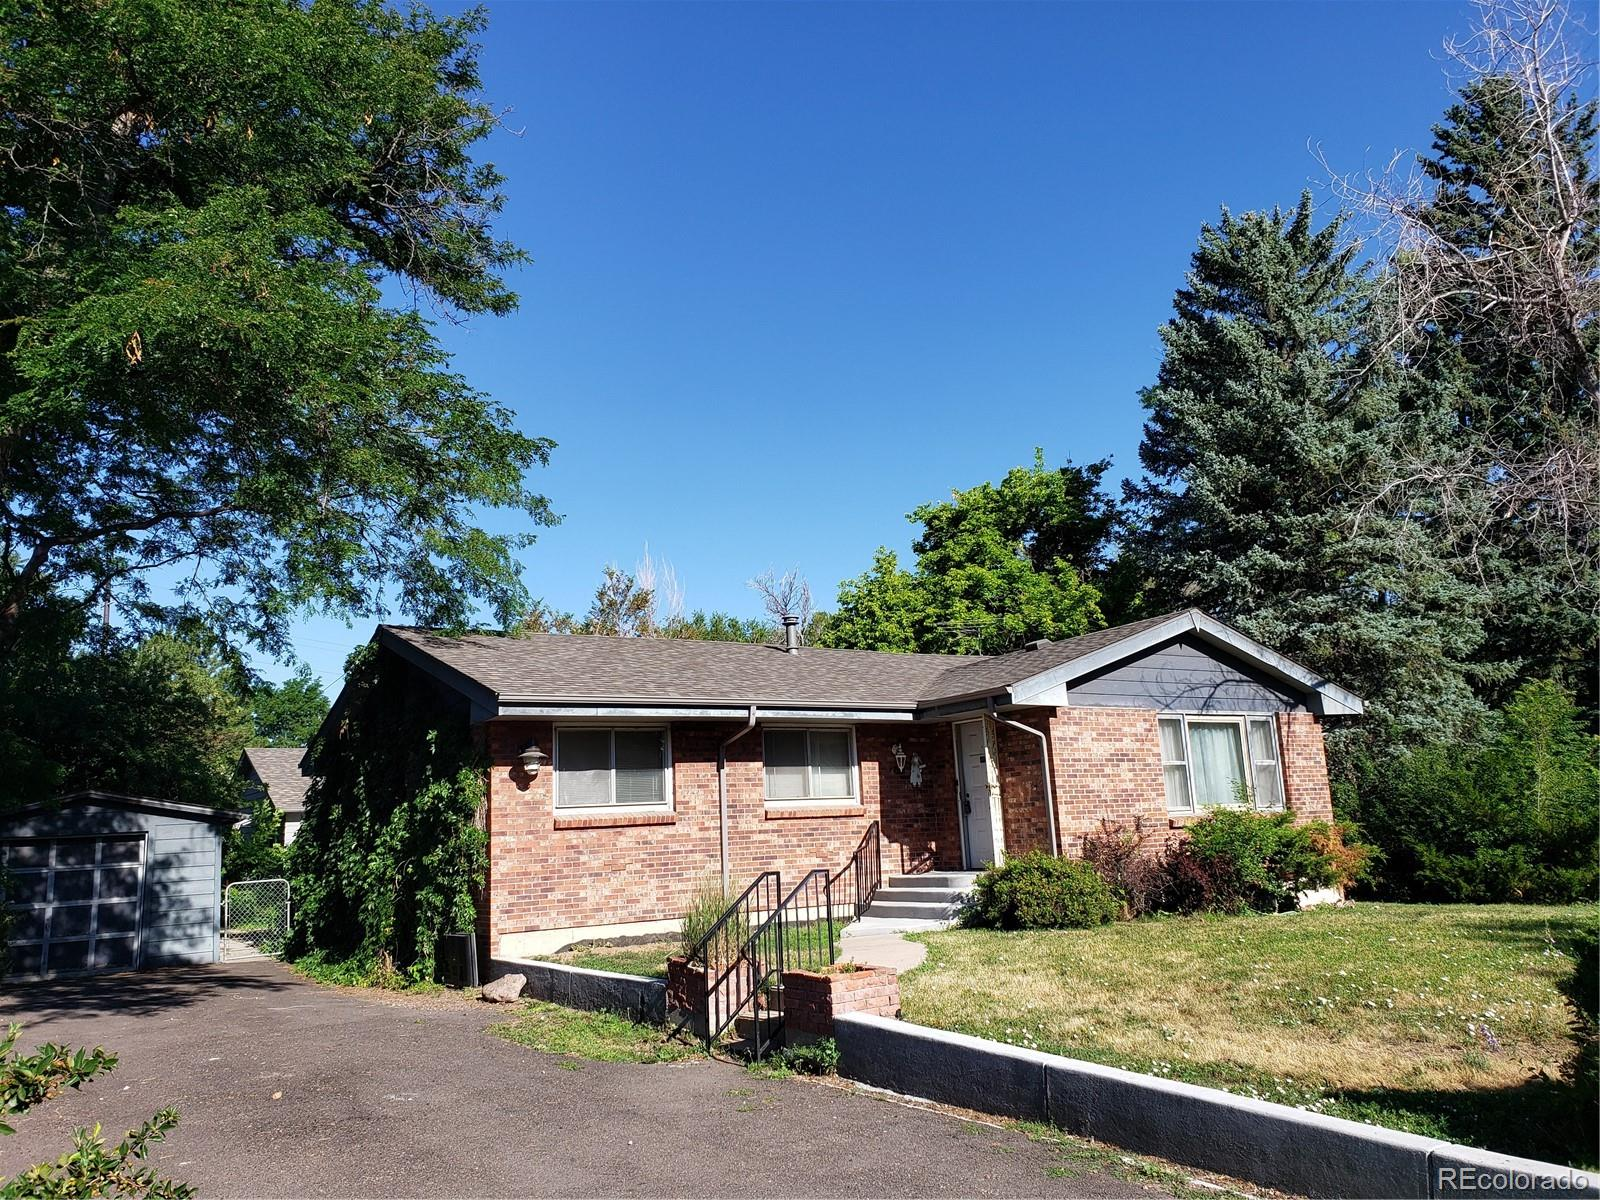 MLS# 8960672 - 3 - 1749 Hoyt Street, Lakewood, CO 80215